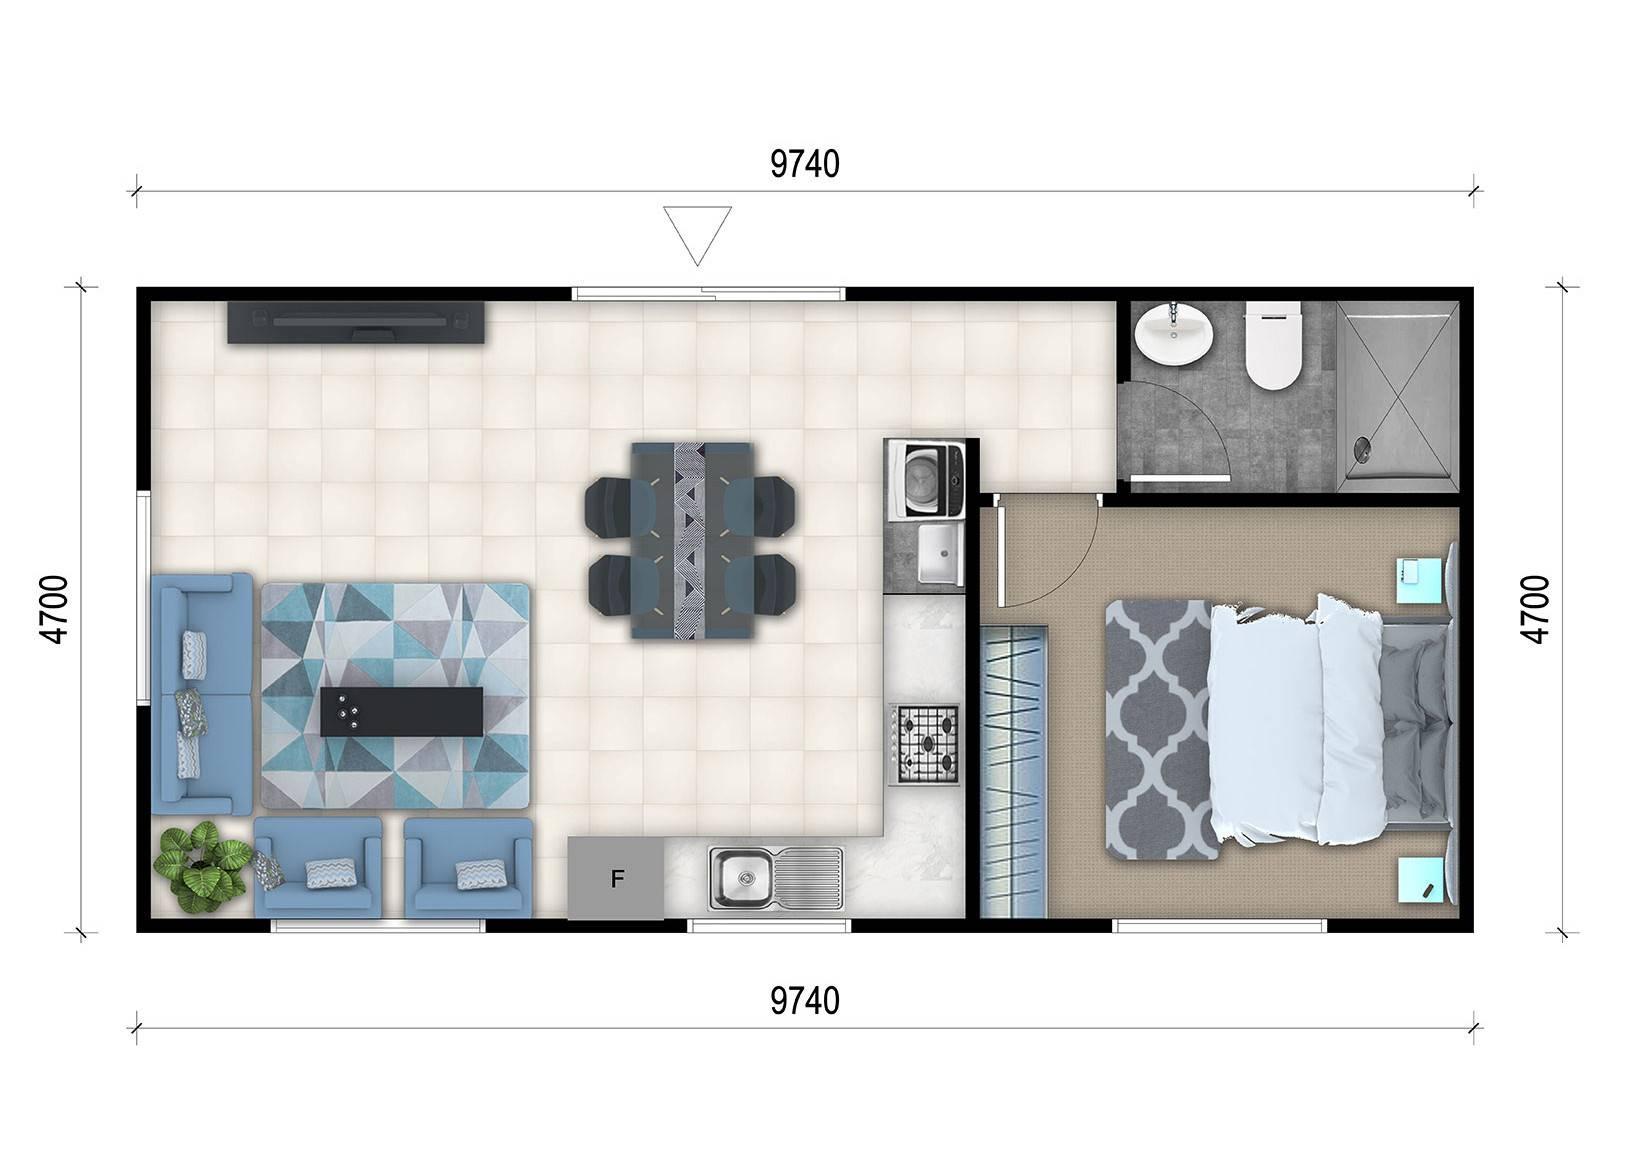 Bedroom Granny Flat Designs - House Plans  #9